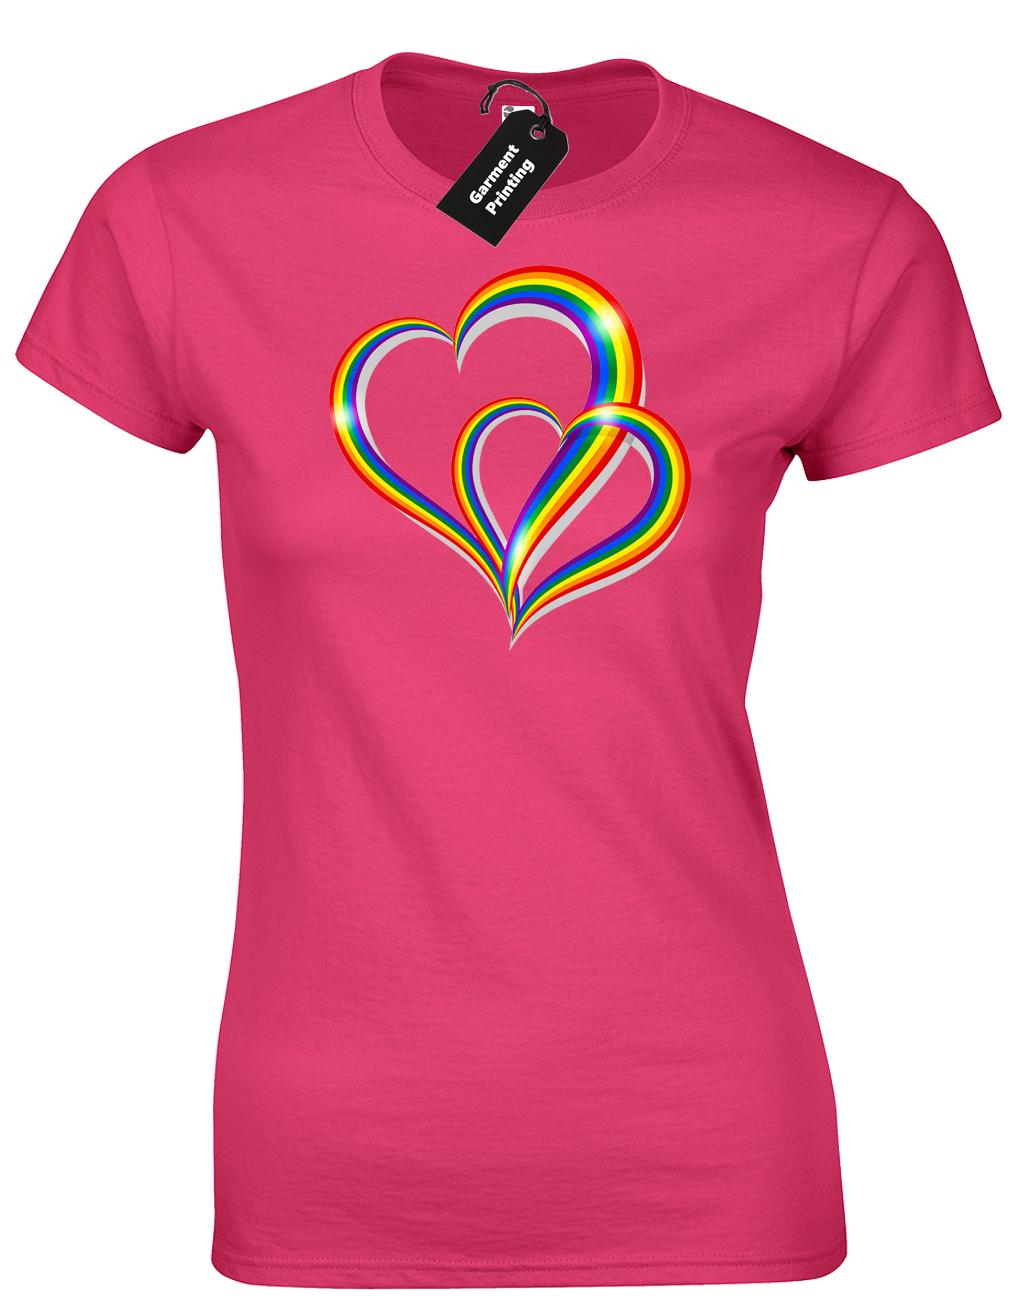 2 Pride Hearts Ladies T-Shirt Gay Lesbian Lgbt Unisex Rainbow Womens Top ( Col) 6